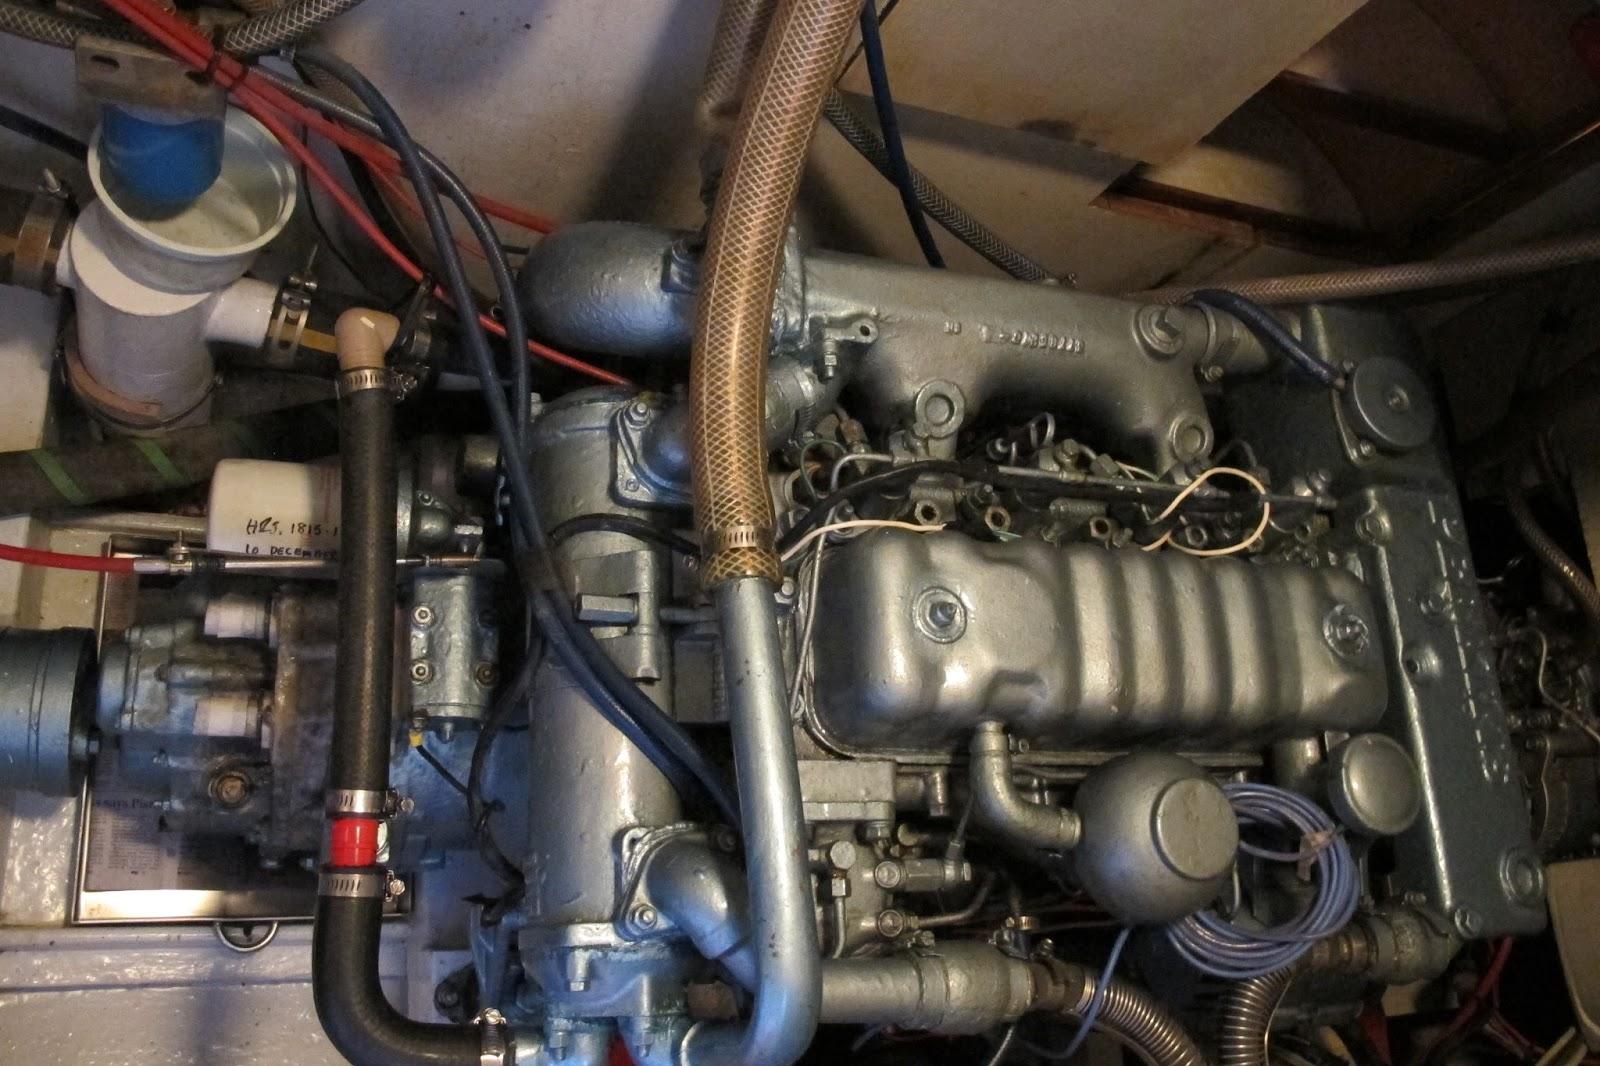 CKD Boats - Roy Mc Bride: How to bleed a Perkins 4108 marine diesel